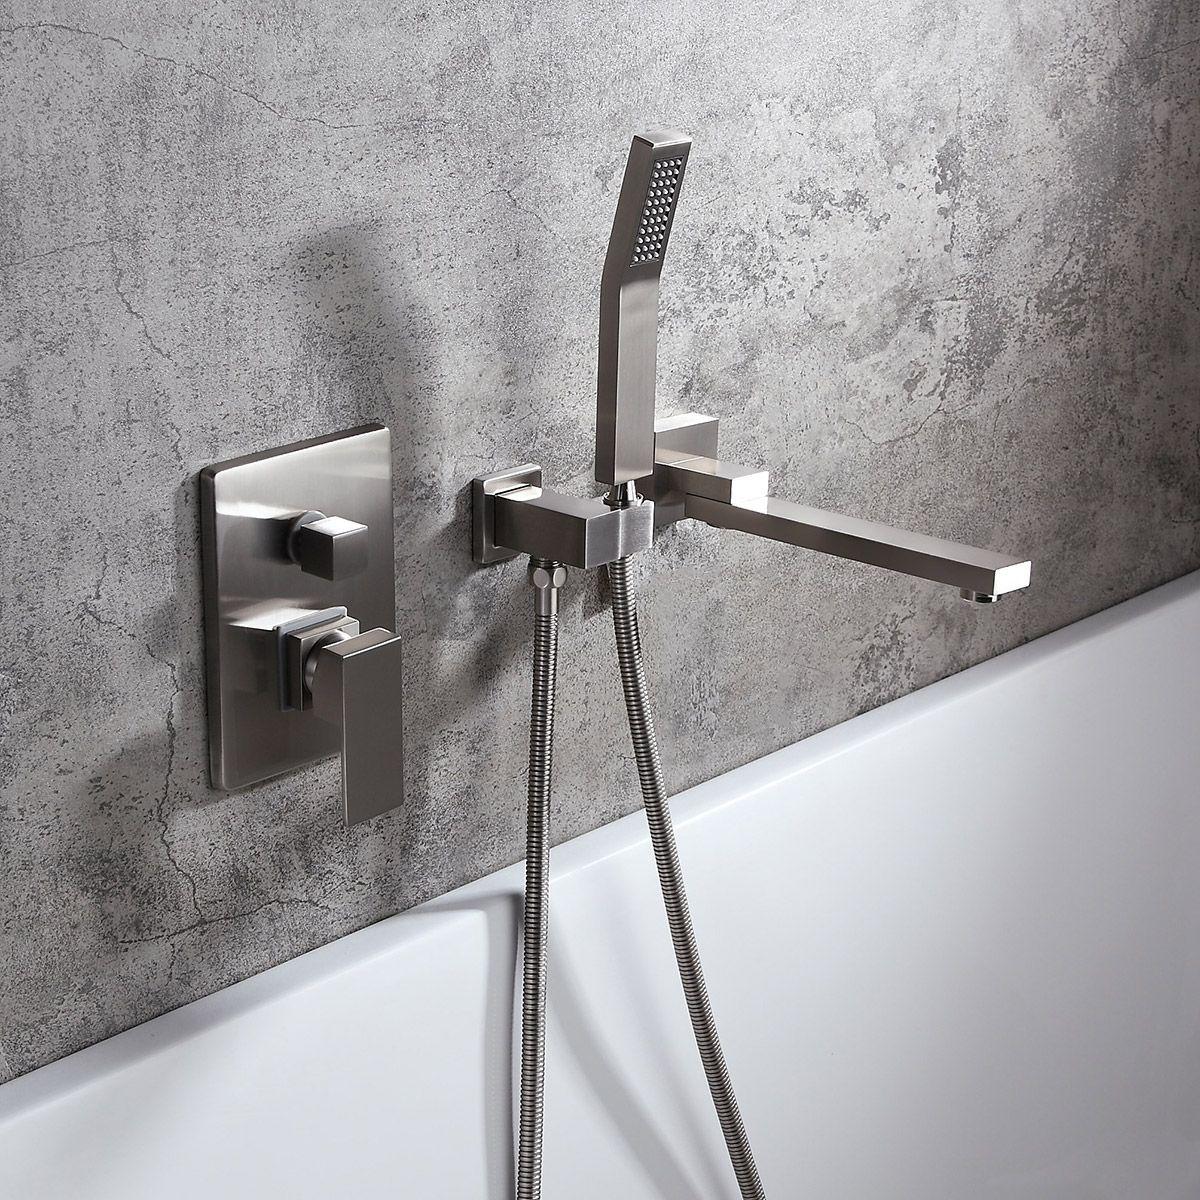 Modern Wall Mounted Brushed Swivel Bathtub Faucet/&Handheld Tub Shower Tap Brass